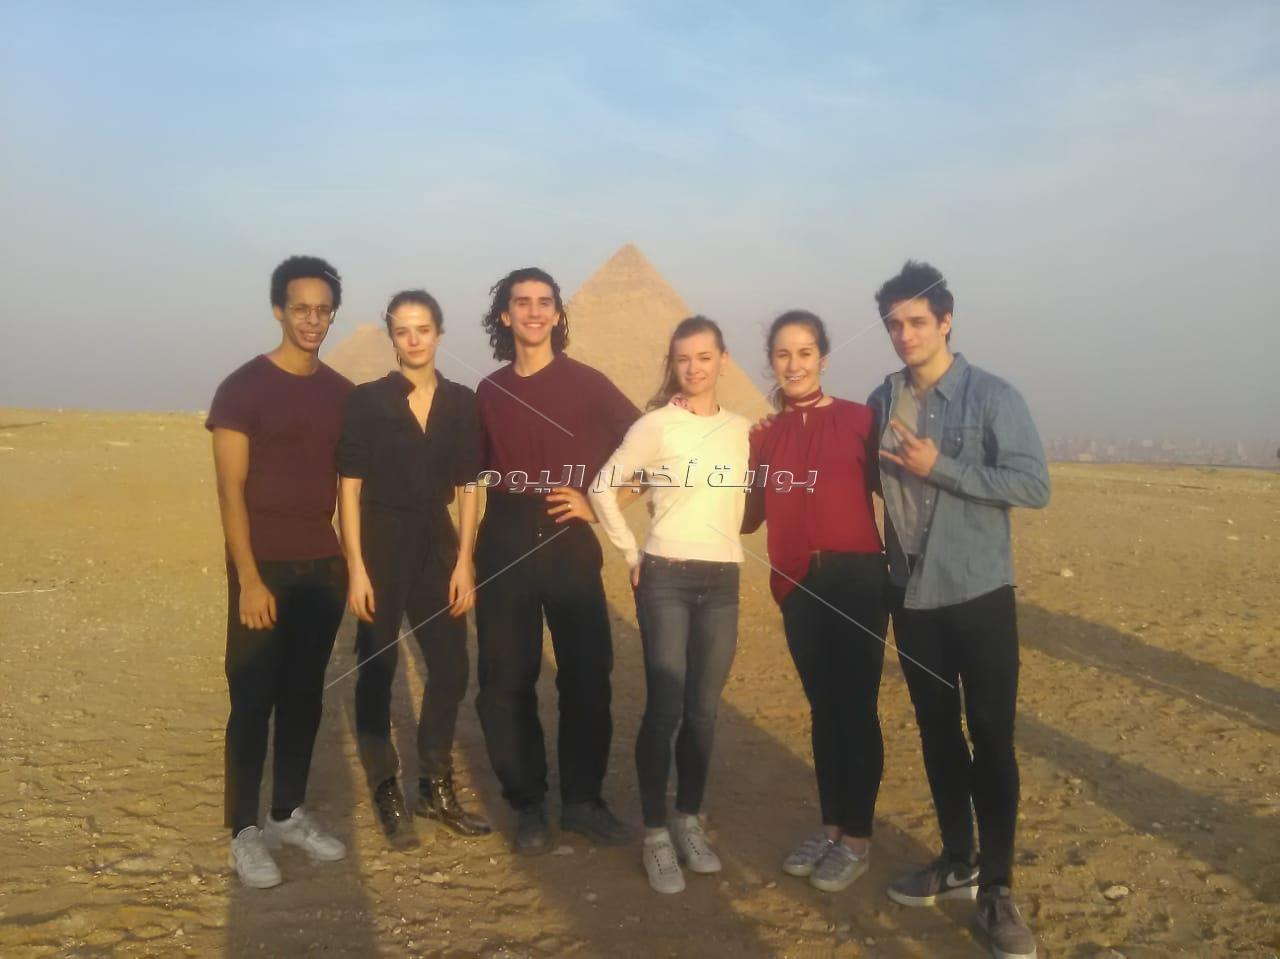 فريق أوبرا باريس يزور الاهرامات